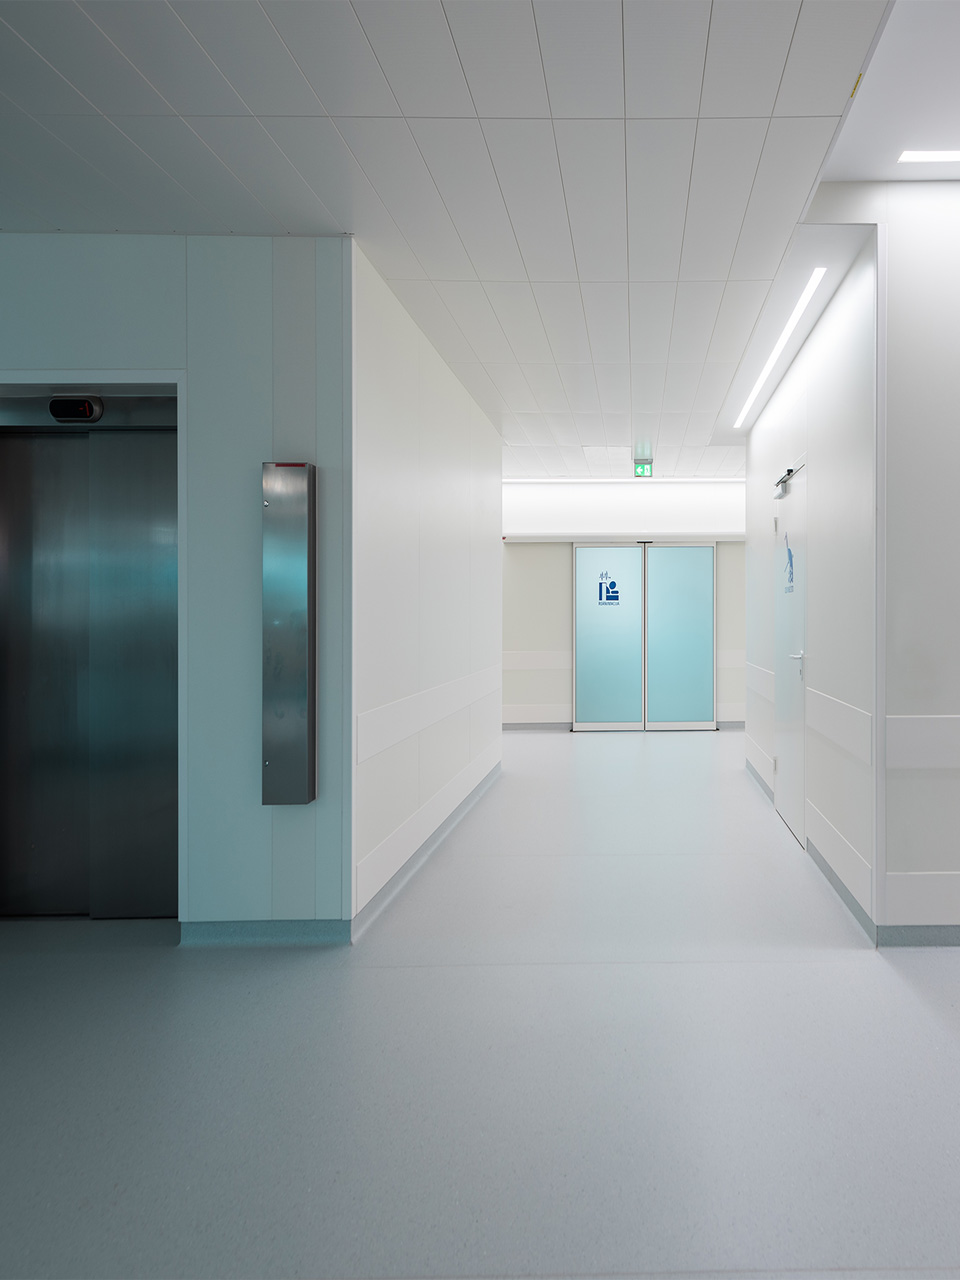 B1 Intensive care hospital Novo mesto